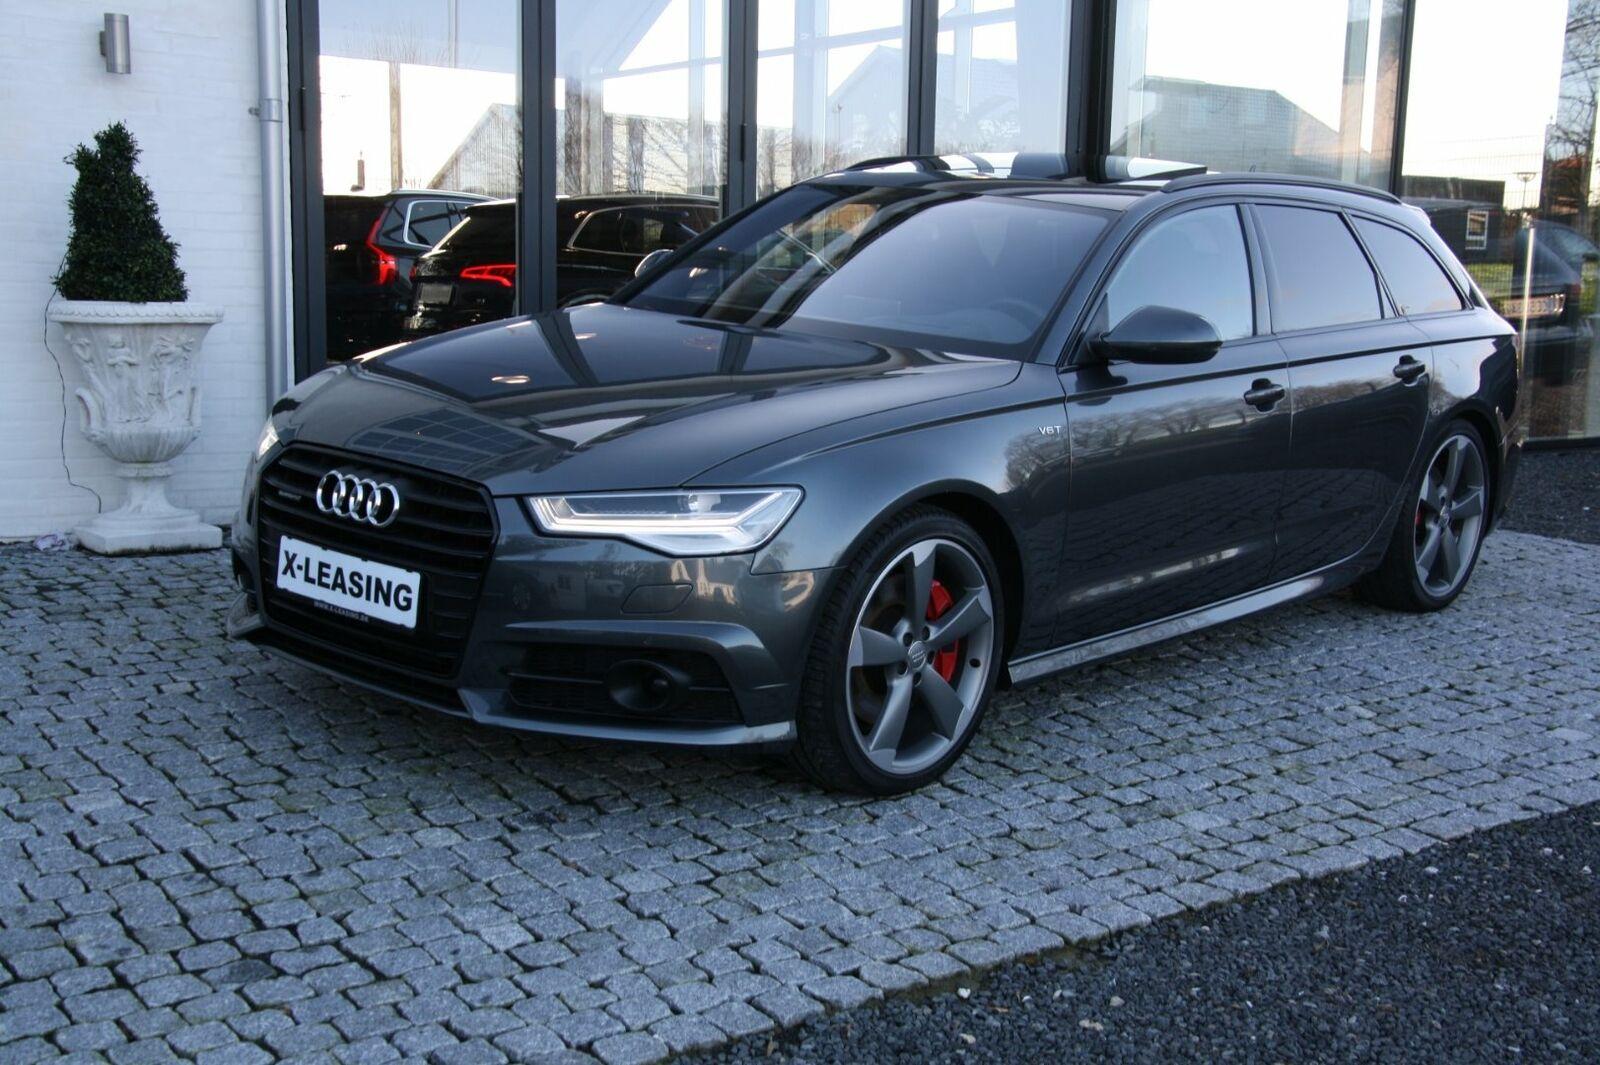 Audi A6 3,0 TDi 326 Avant quattro Tiptr. 5d - 5.985 kr.